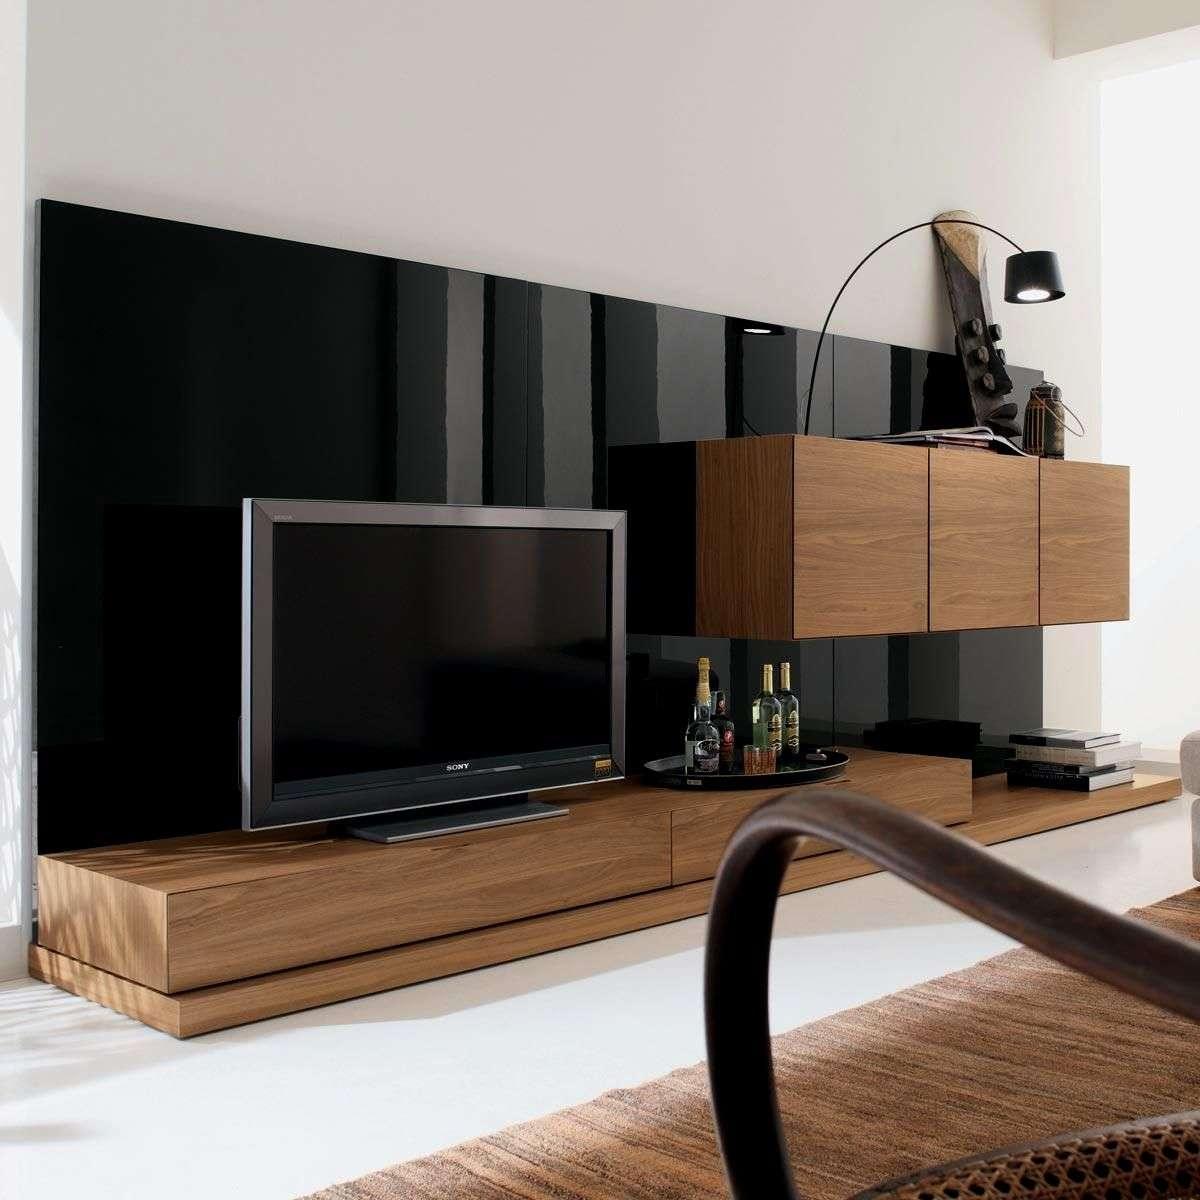 Home Design Modern Tv Cabinet Fantastic | Zhydoor Regarding Modern Tv Cabinets (View 18 of 20)